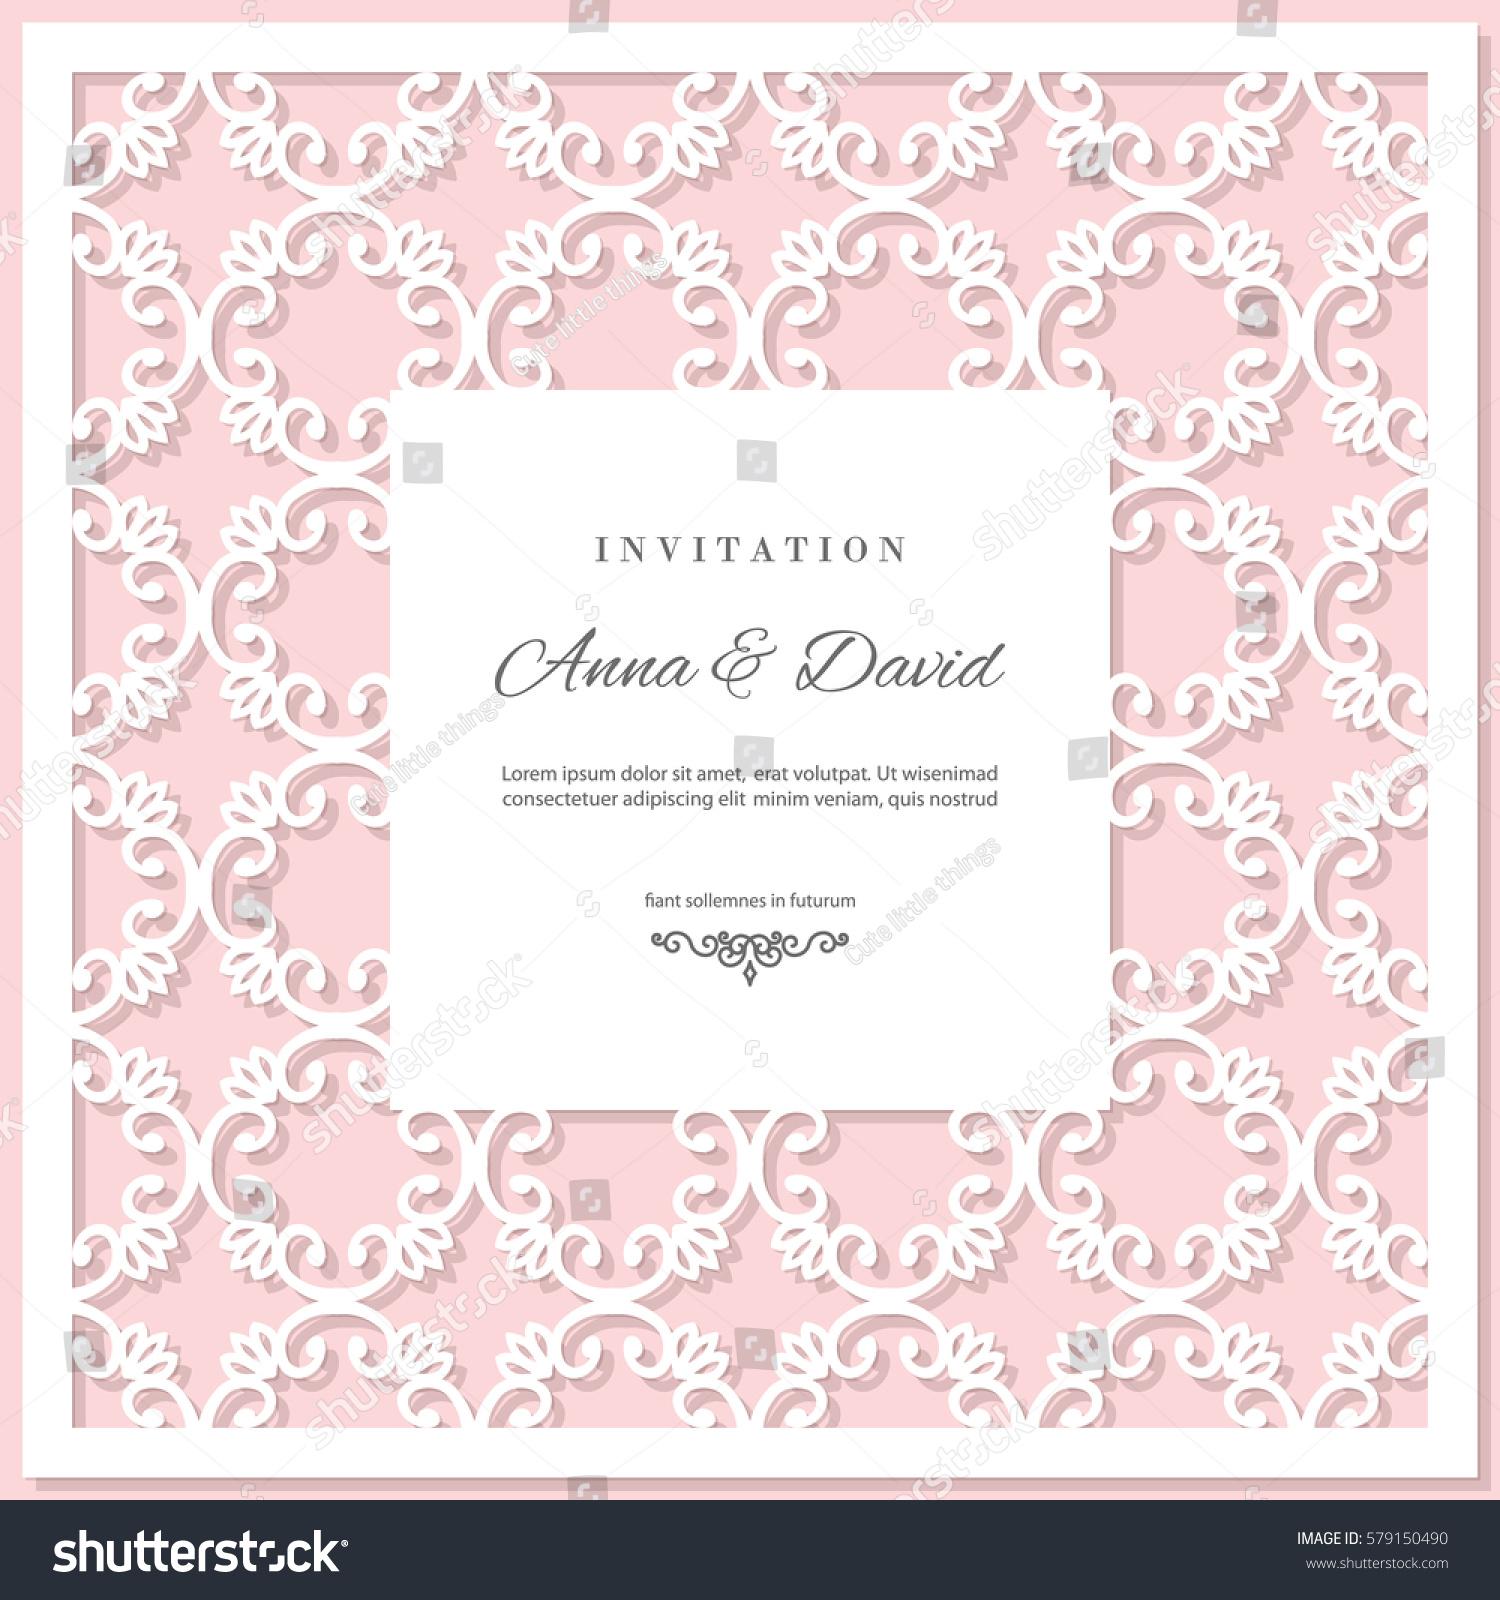 Wedding Invitation Card Template Laser Cutting Stock Vector ...